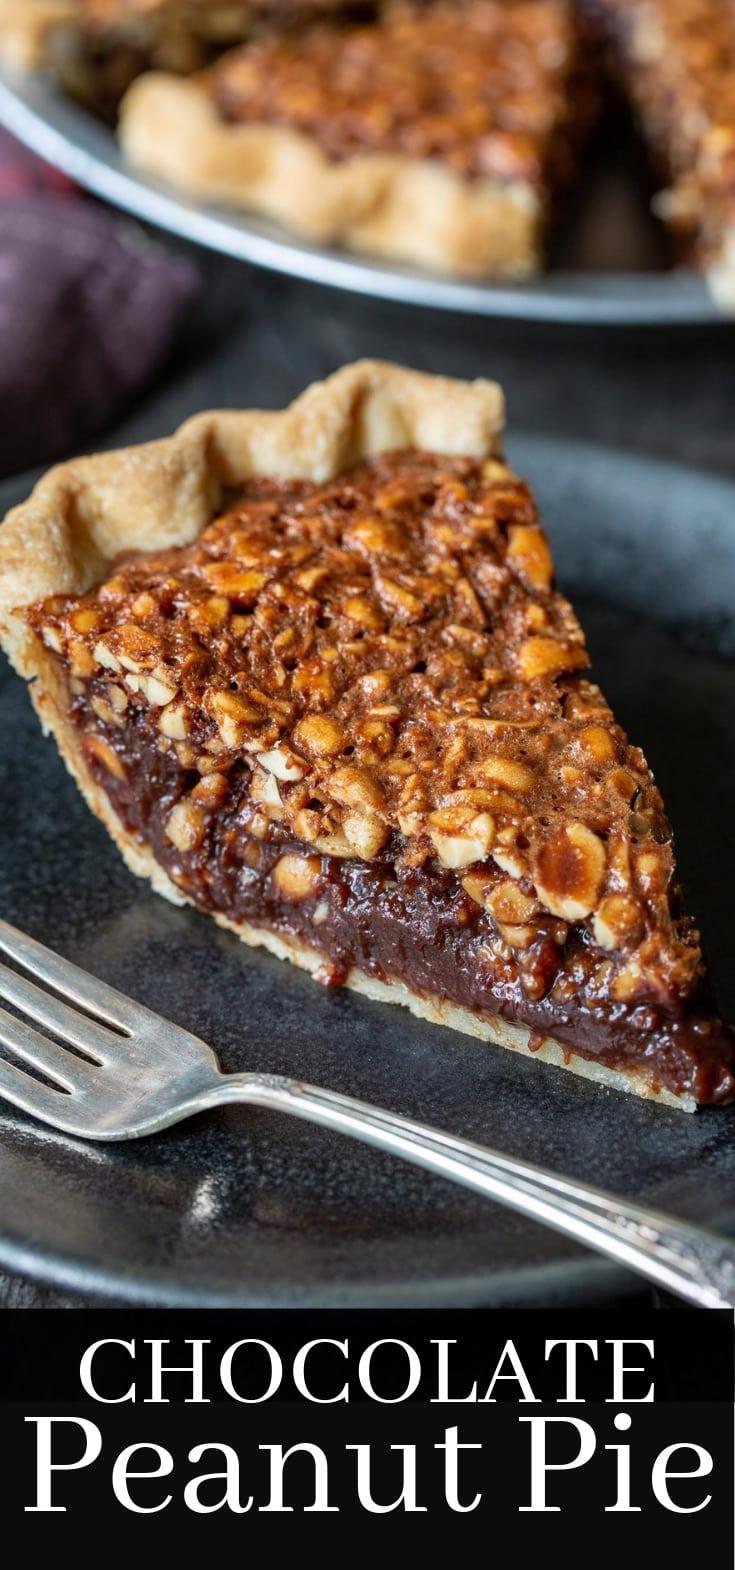 A slice of chocolate peanut pie on a plate